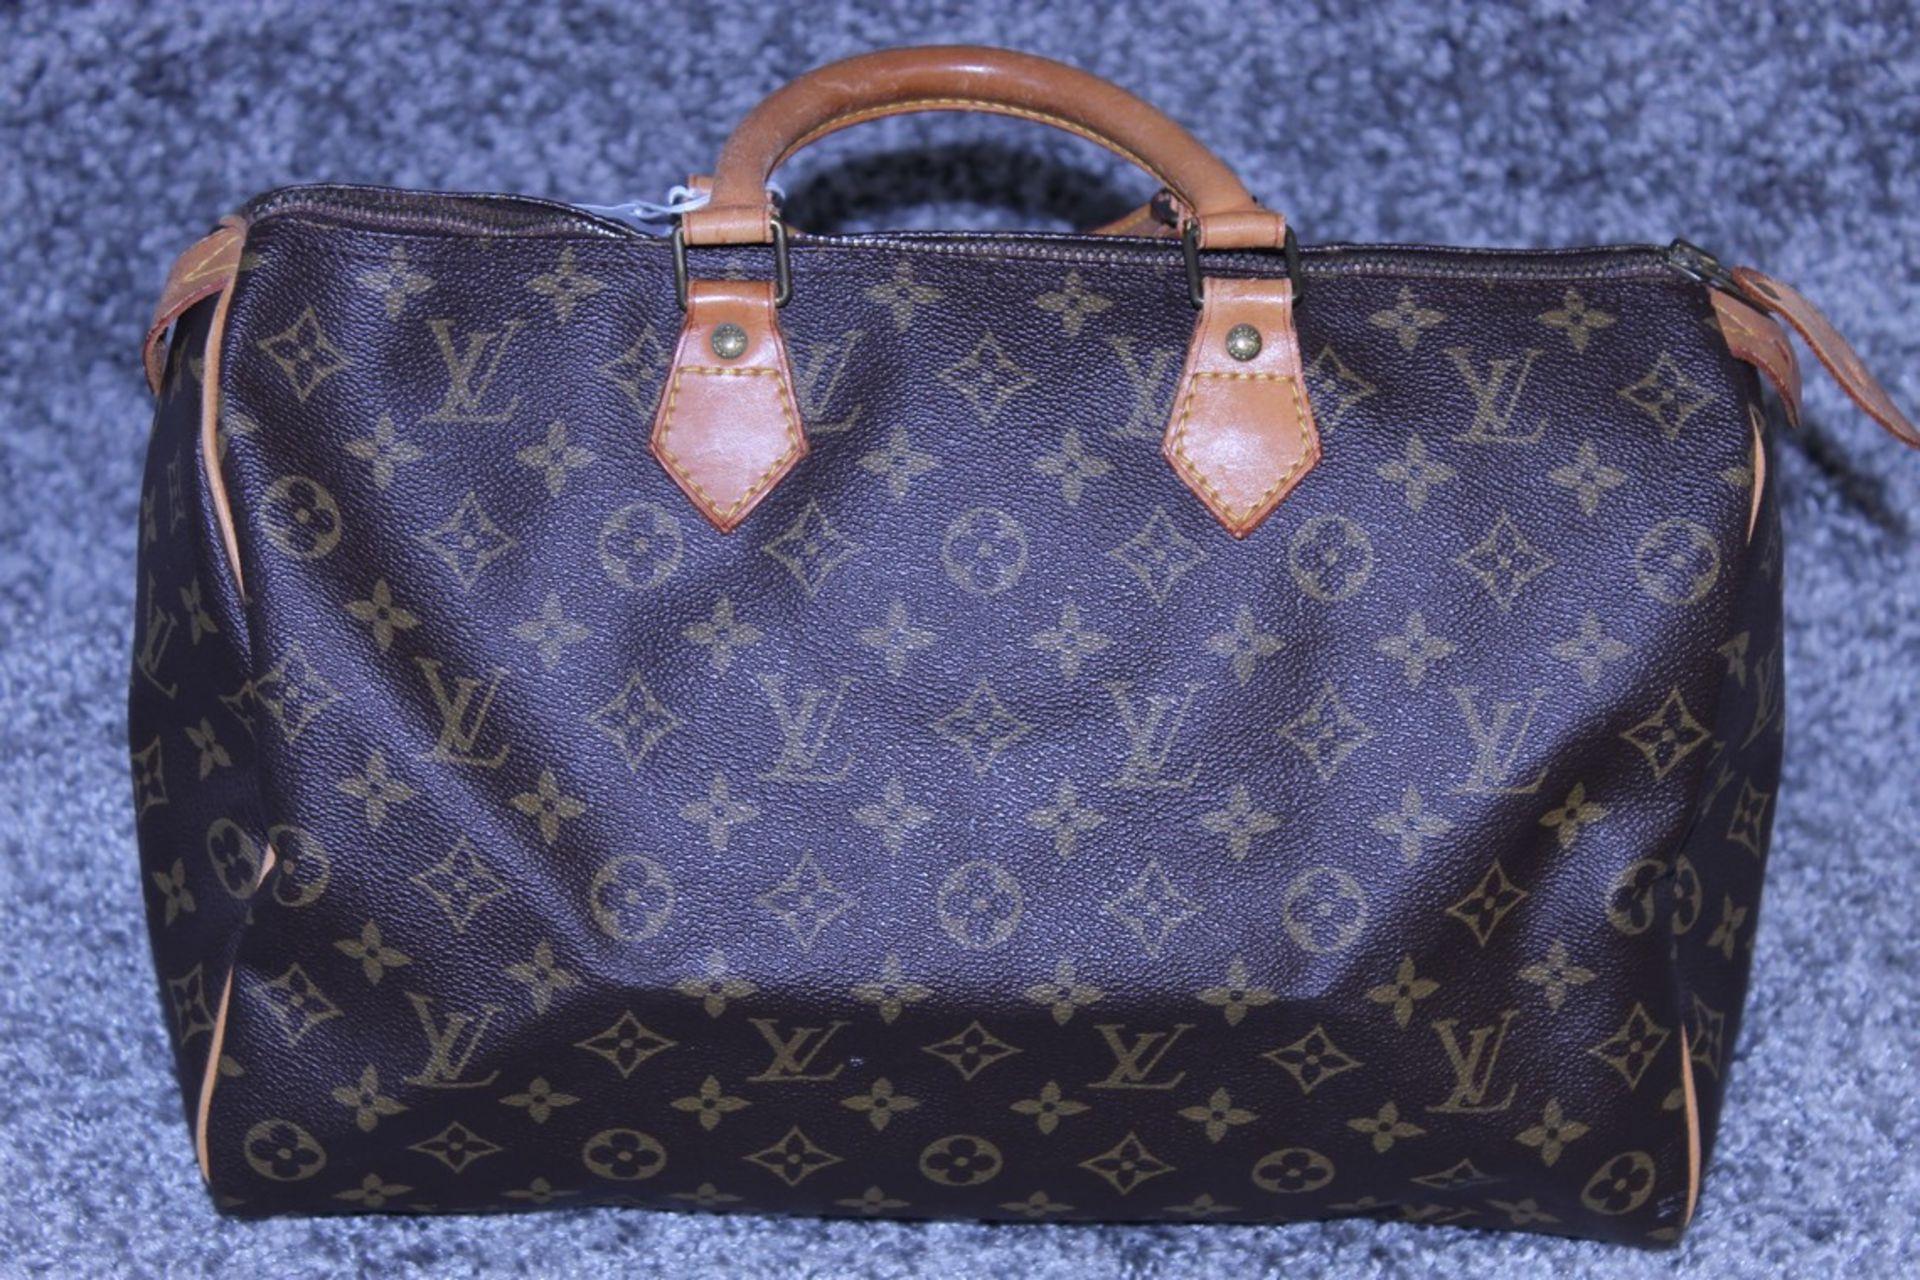 RRP £1100 Louis Vuitton Speedy Brown Coated Monogram Canvas Handbag With Vachetta Handles ( - Image 2 of 3